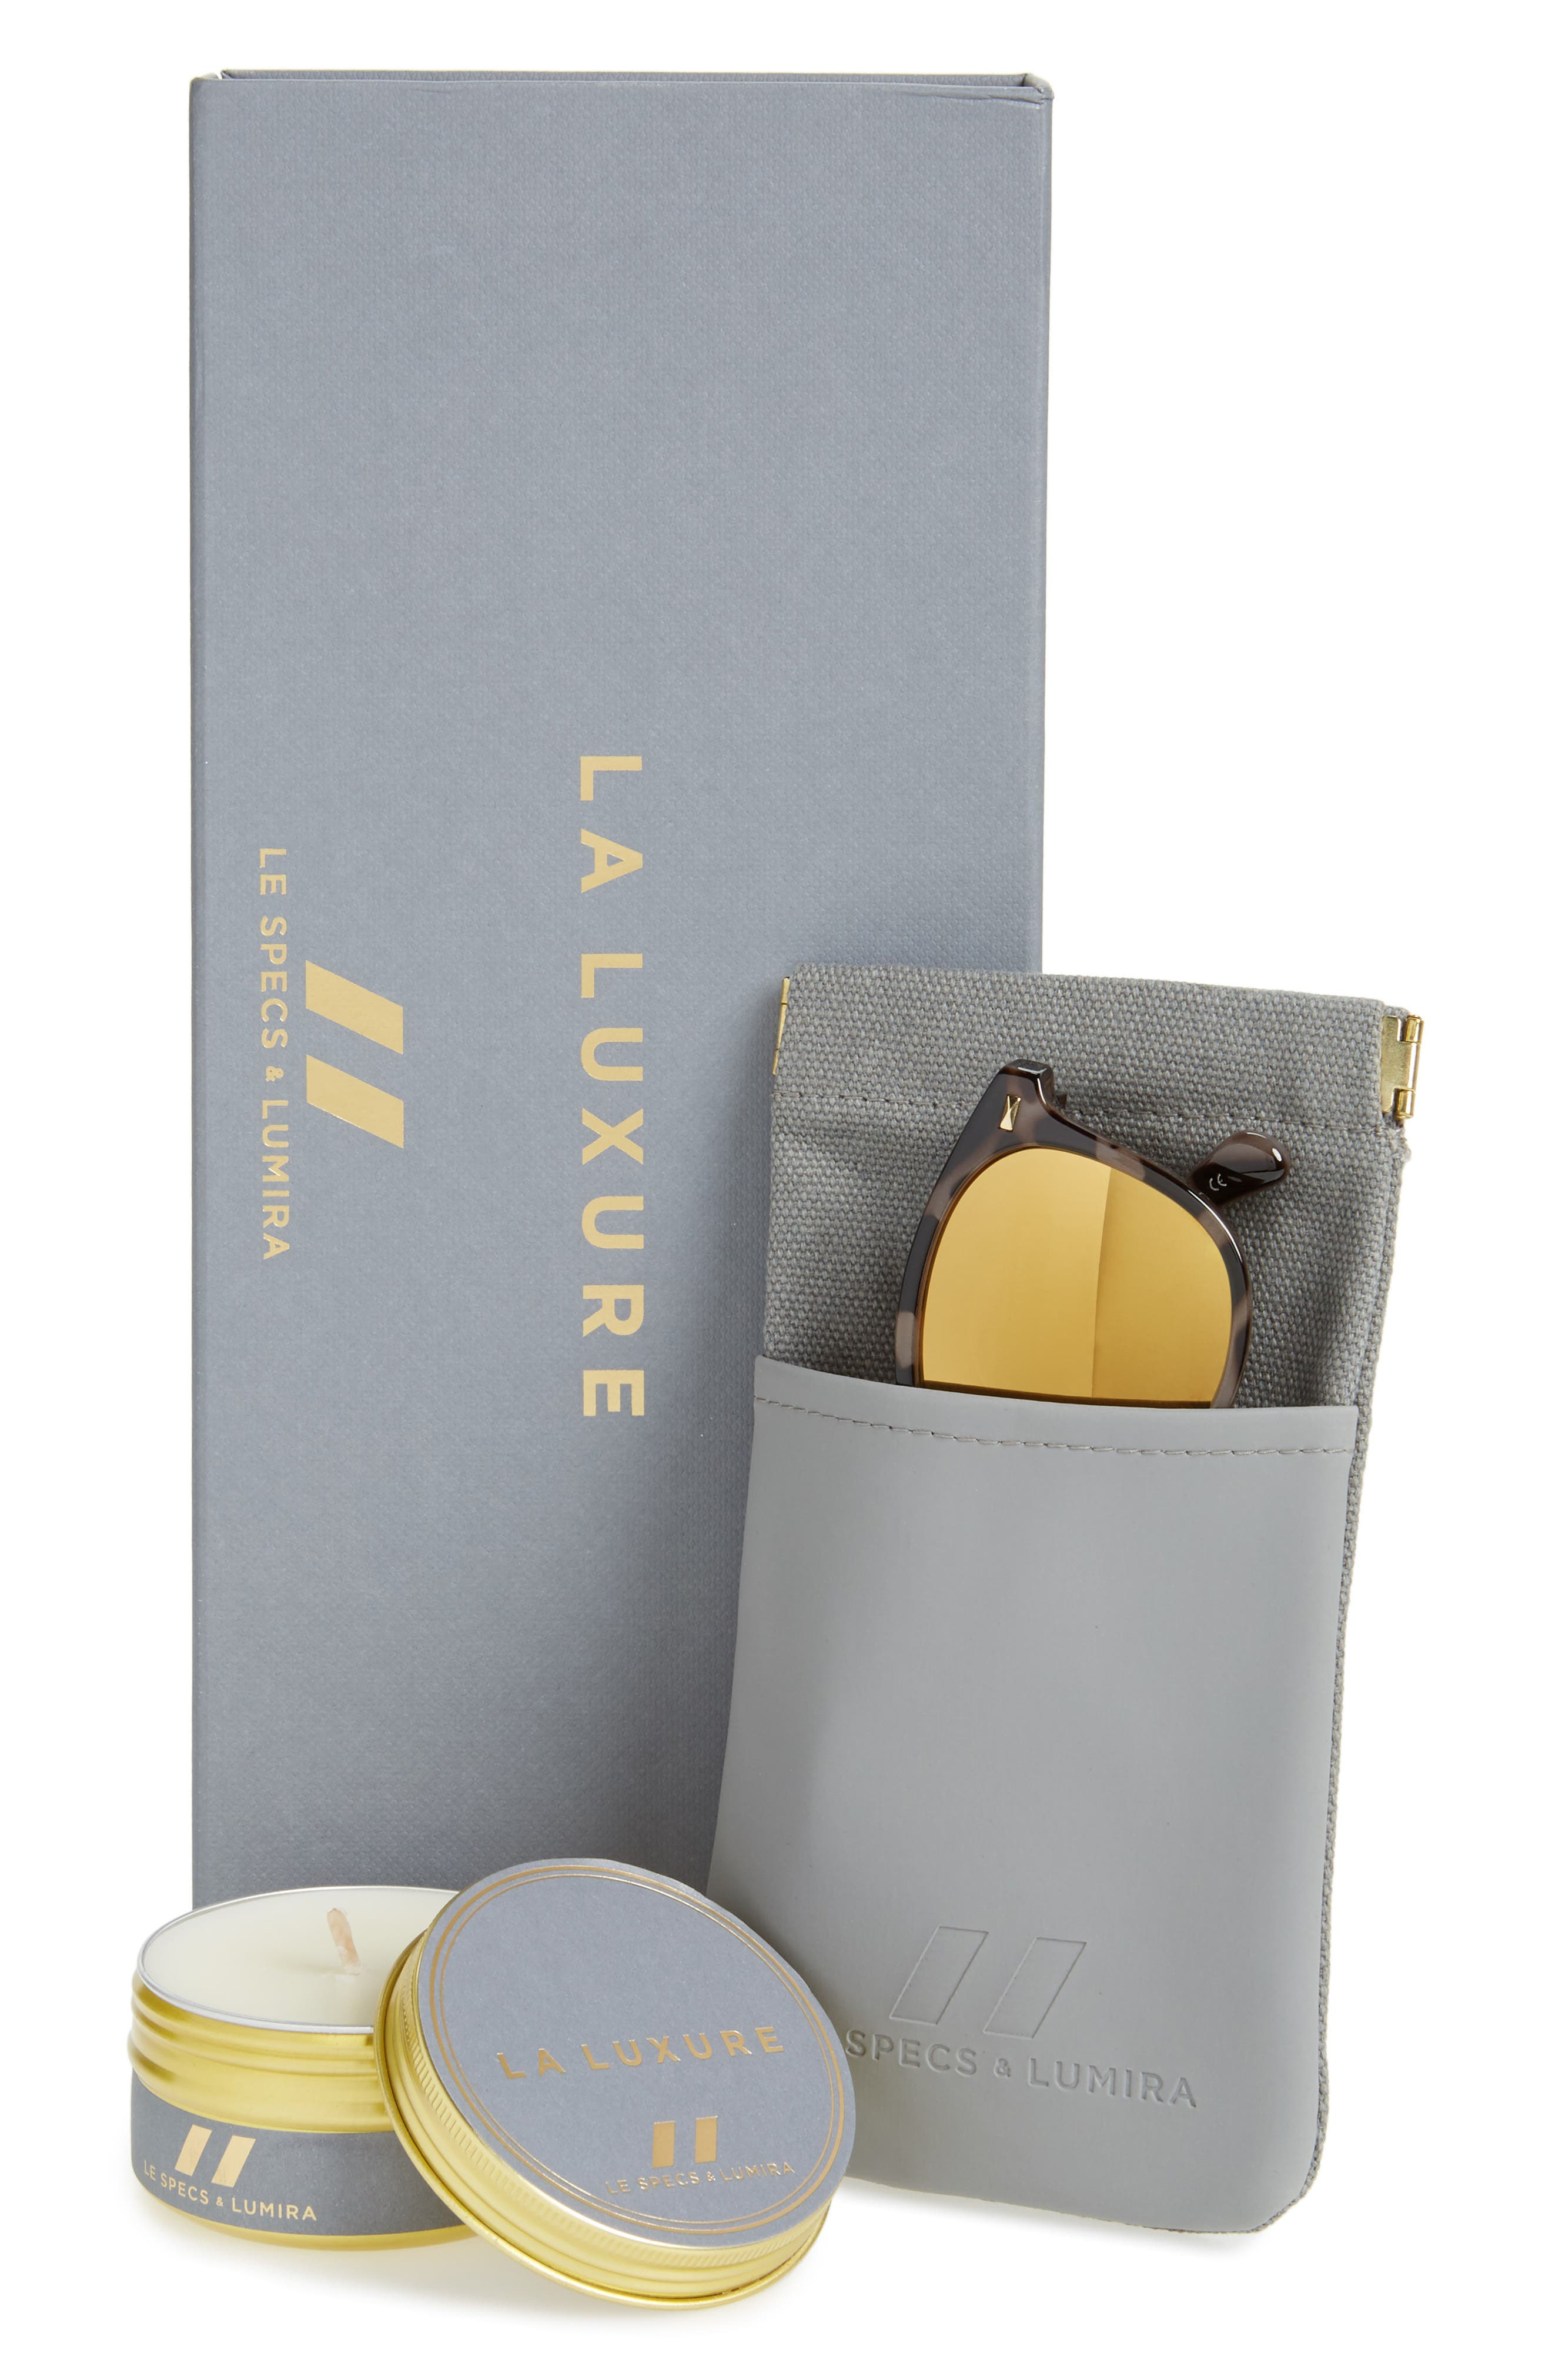 x Lumira Bandwagon 51mm Sunglasses & Candle Gift Set,                             Alternate thumbnail 2, color,                             Volcanic Tort